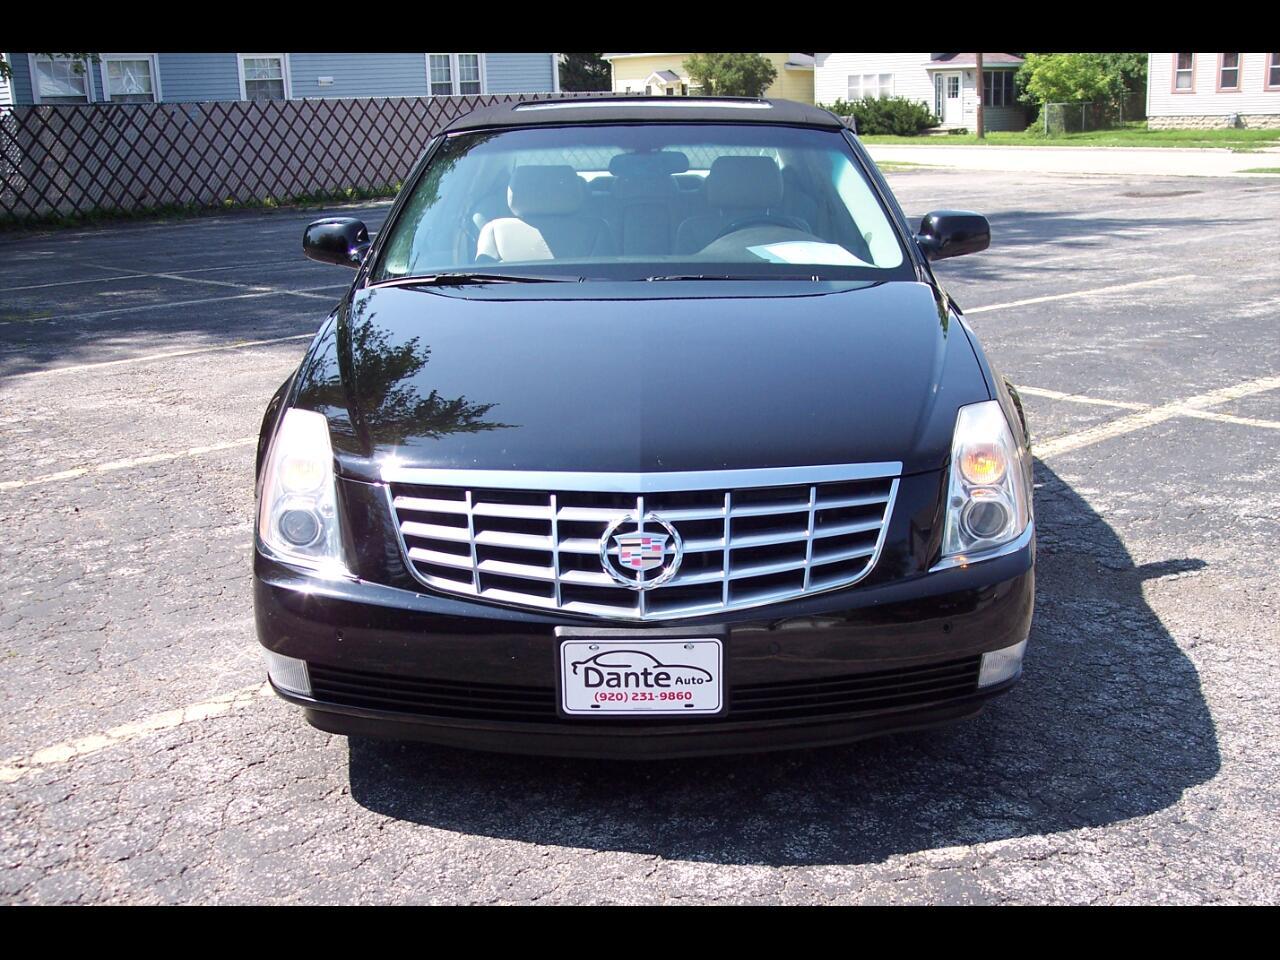 Cadillac DTS 4dr Sdn Luxury I 2007